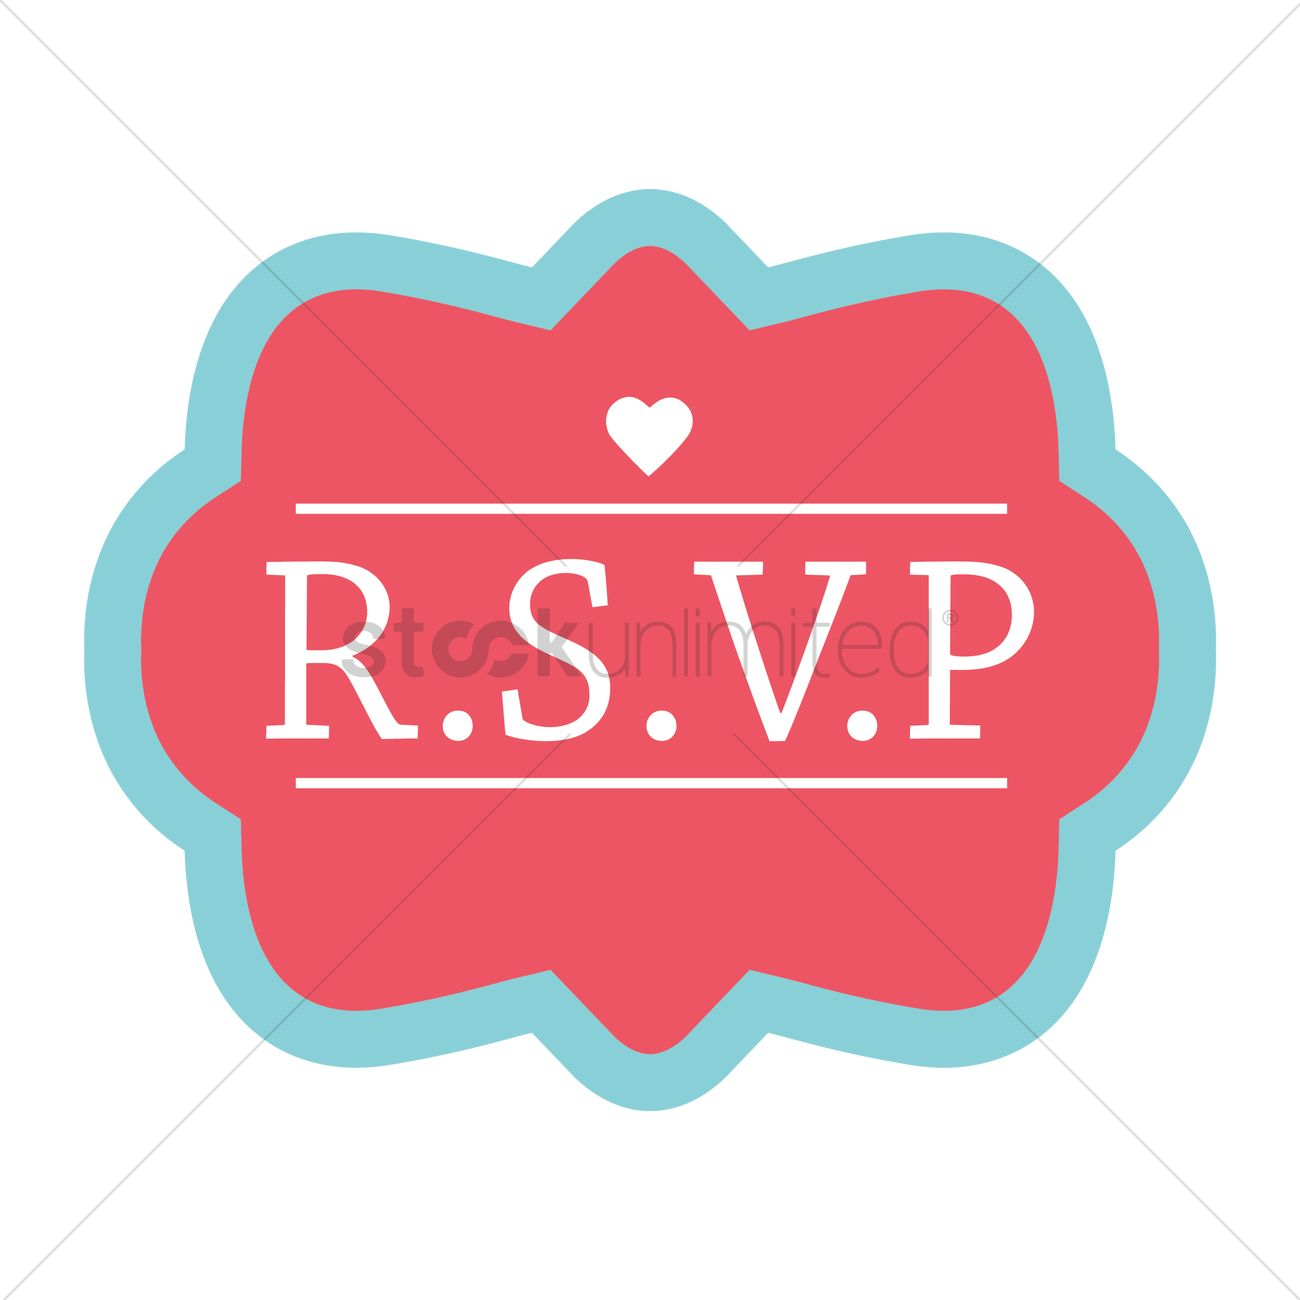 Wedding invitation design Vector Image - 1986242 | StockUnlimited